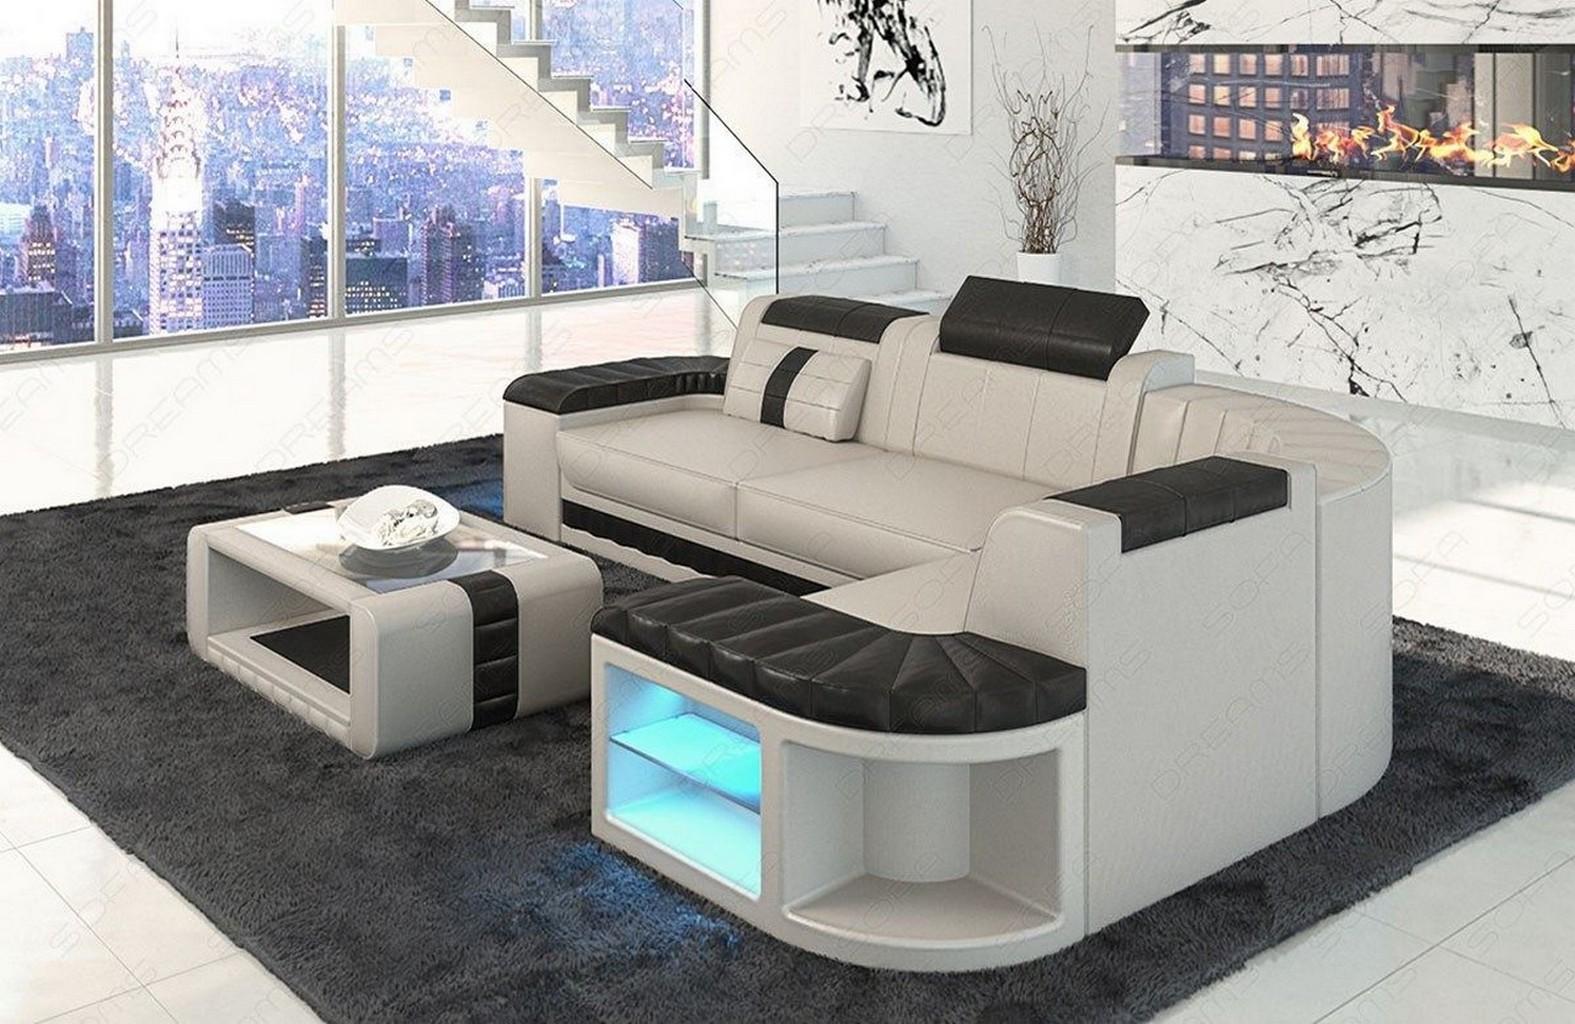 ledercouch ecksofa bergamo l form designer couch garnitur. Black Bedroom Furniture Sets. Home Design Ideas